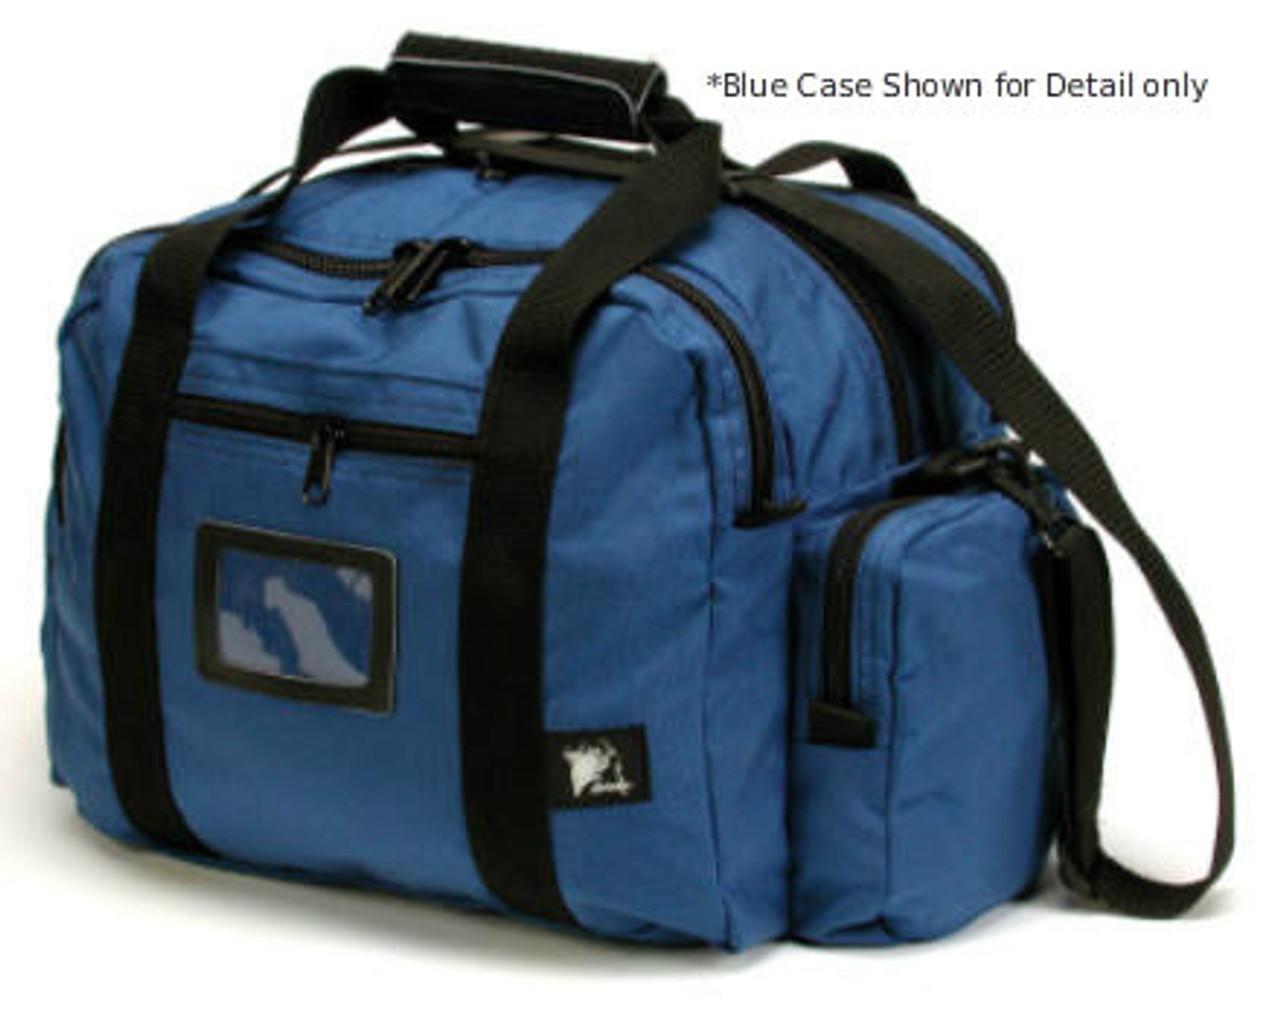 Active Shooter / MCI Bag - Stocked